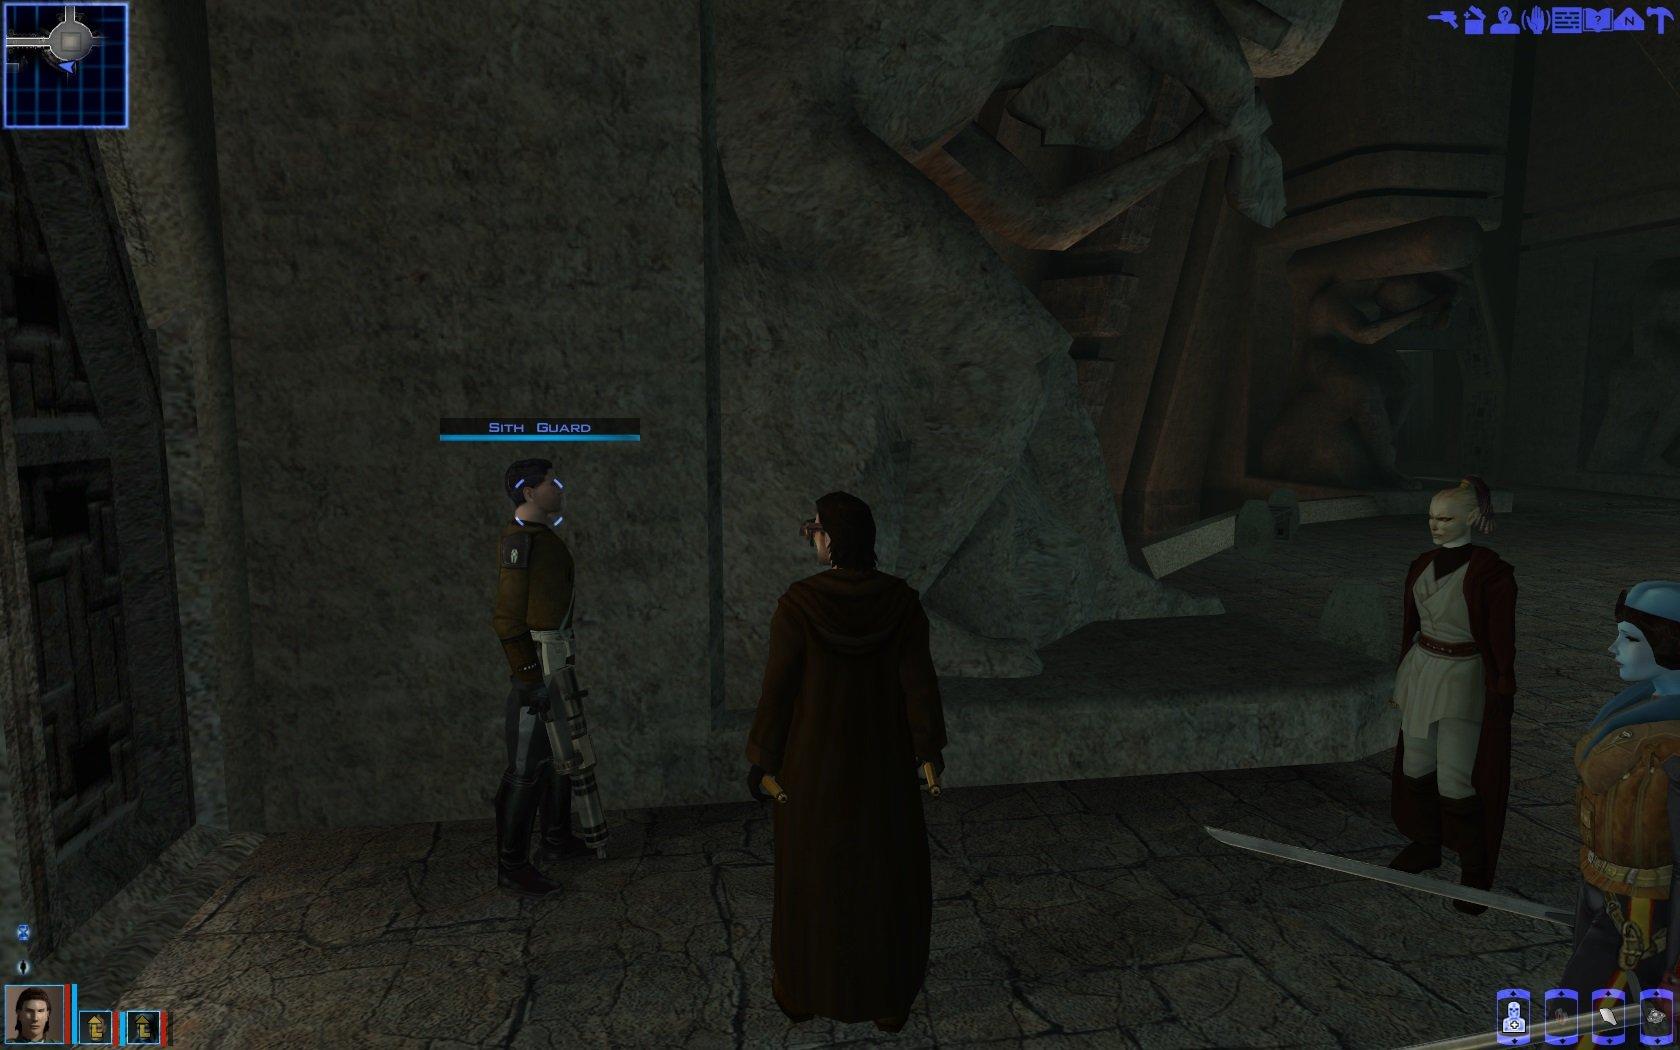 Korriban-Sith-Guard-at-the-academy2.jpg